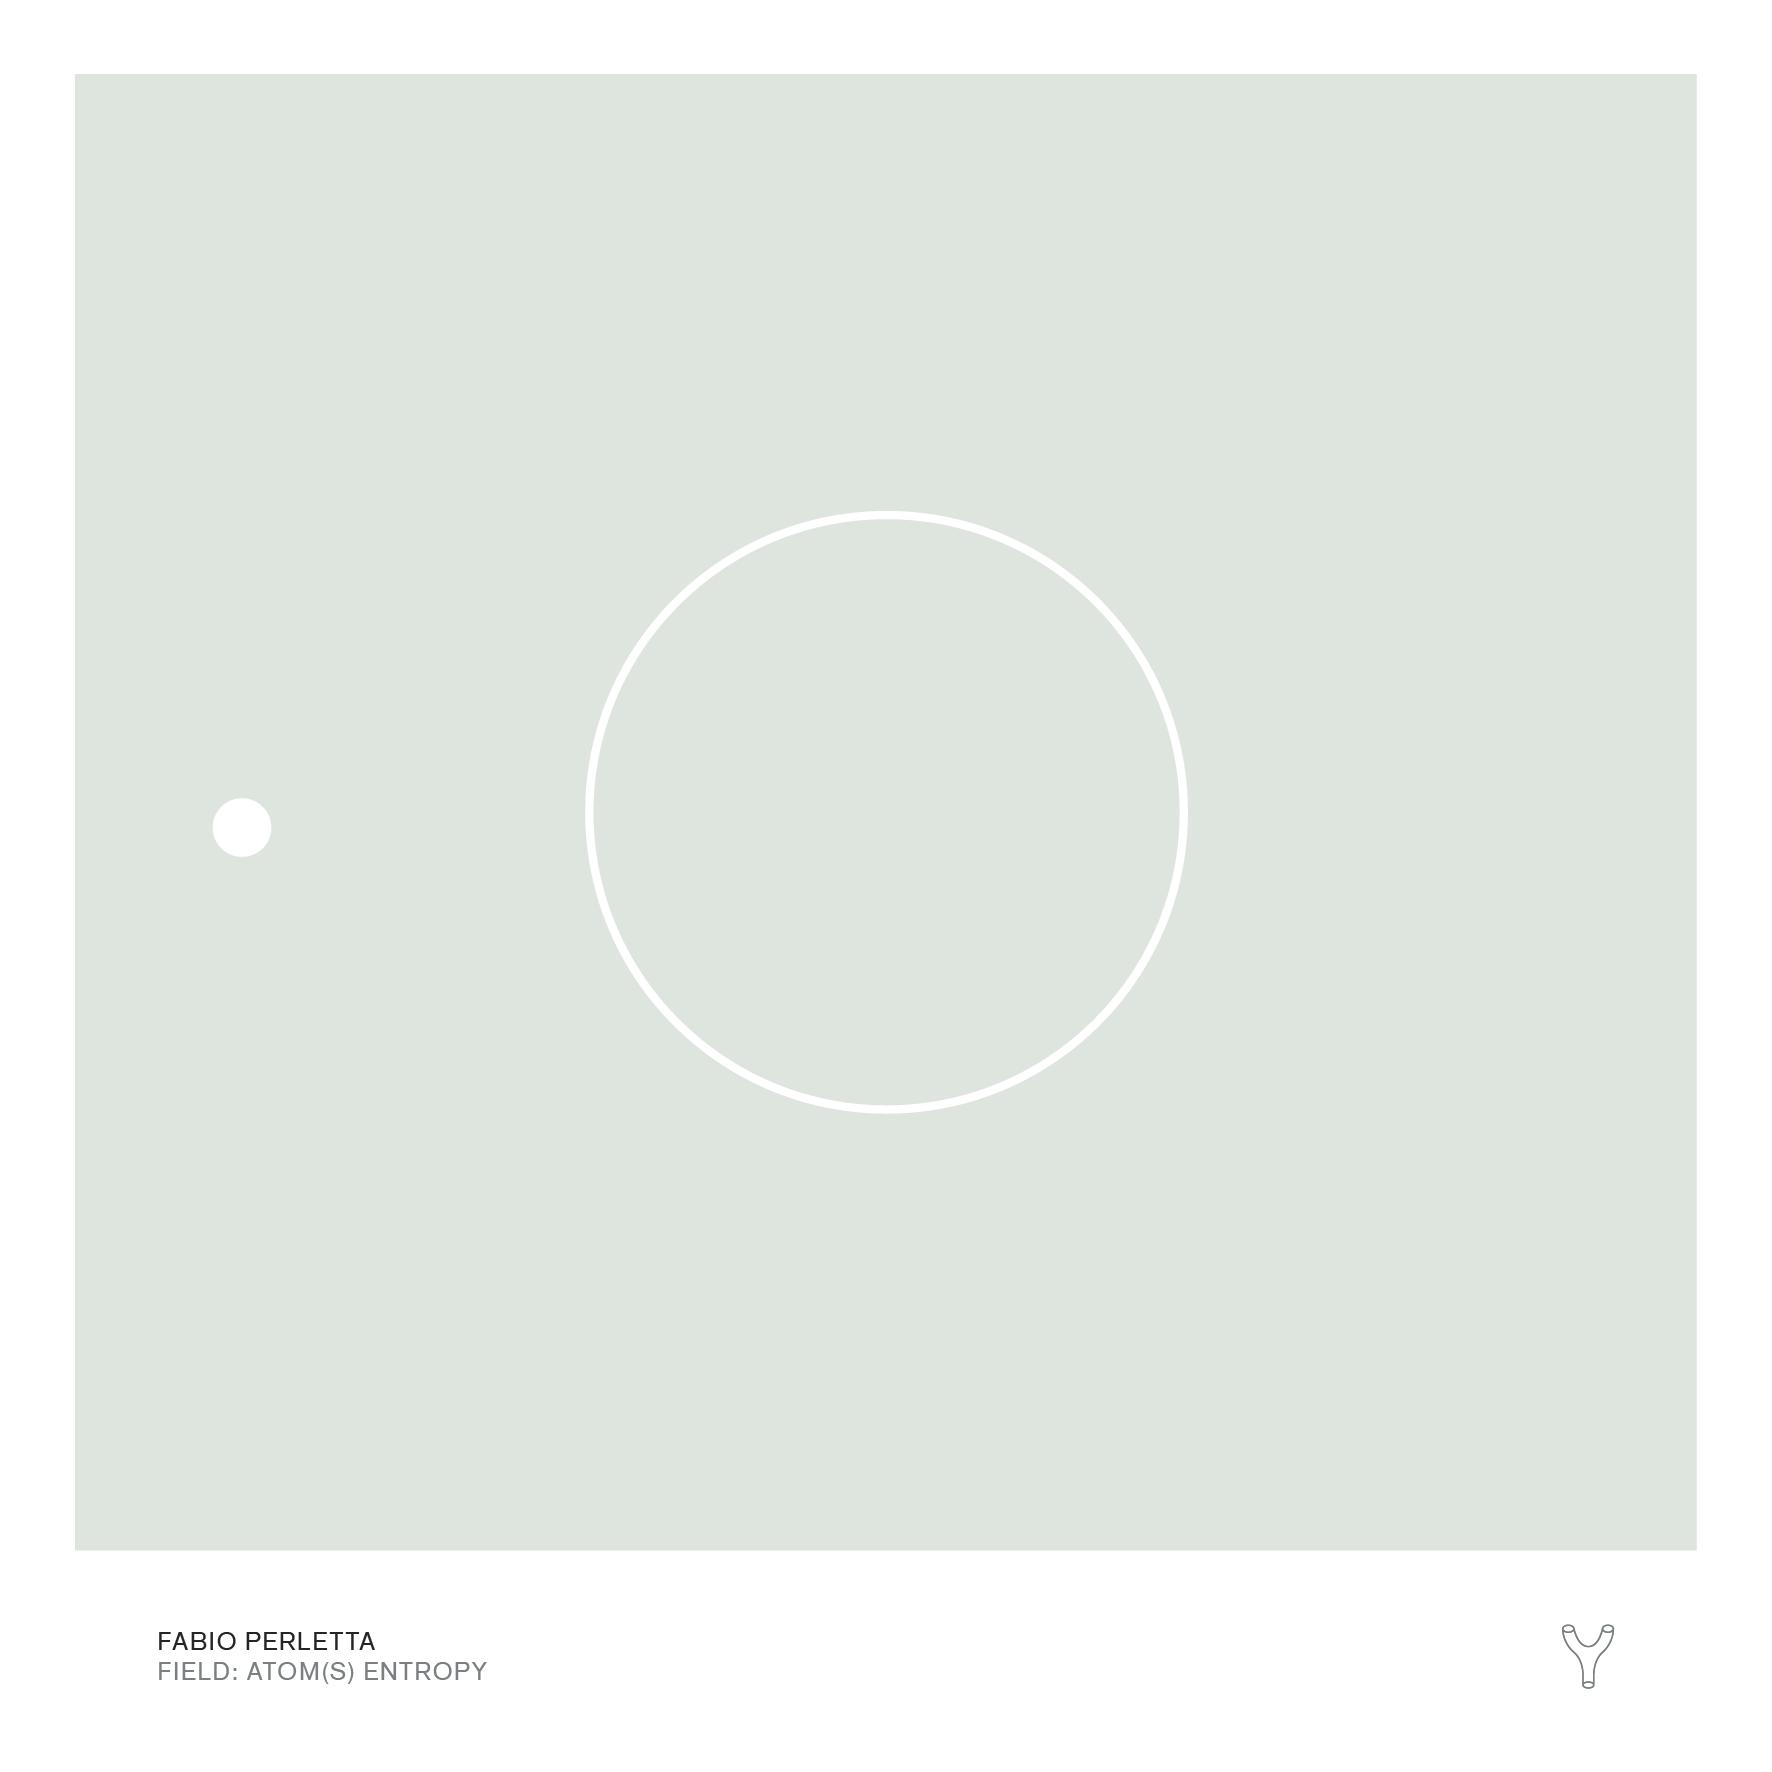 Fabio Perletta — Field: Atom(s) Entropy